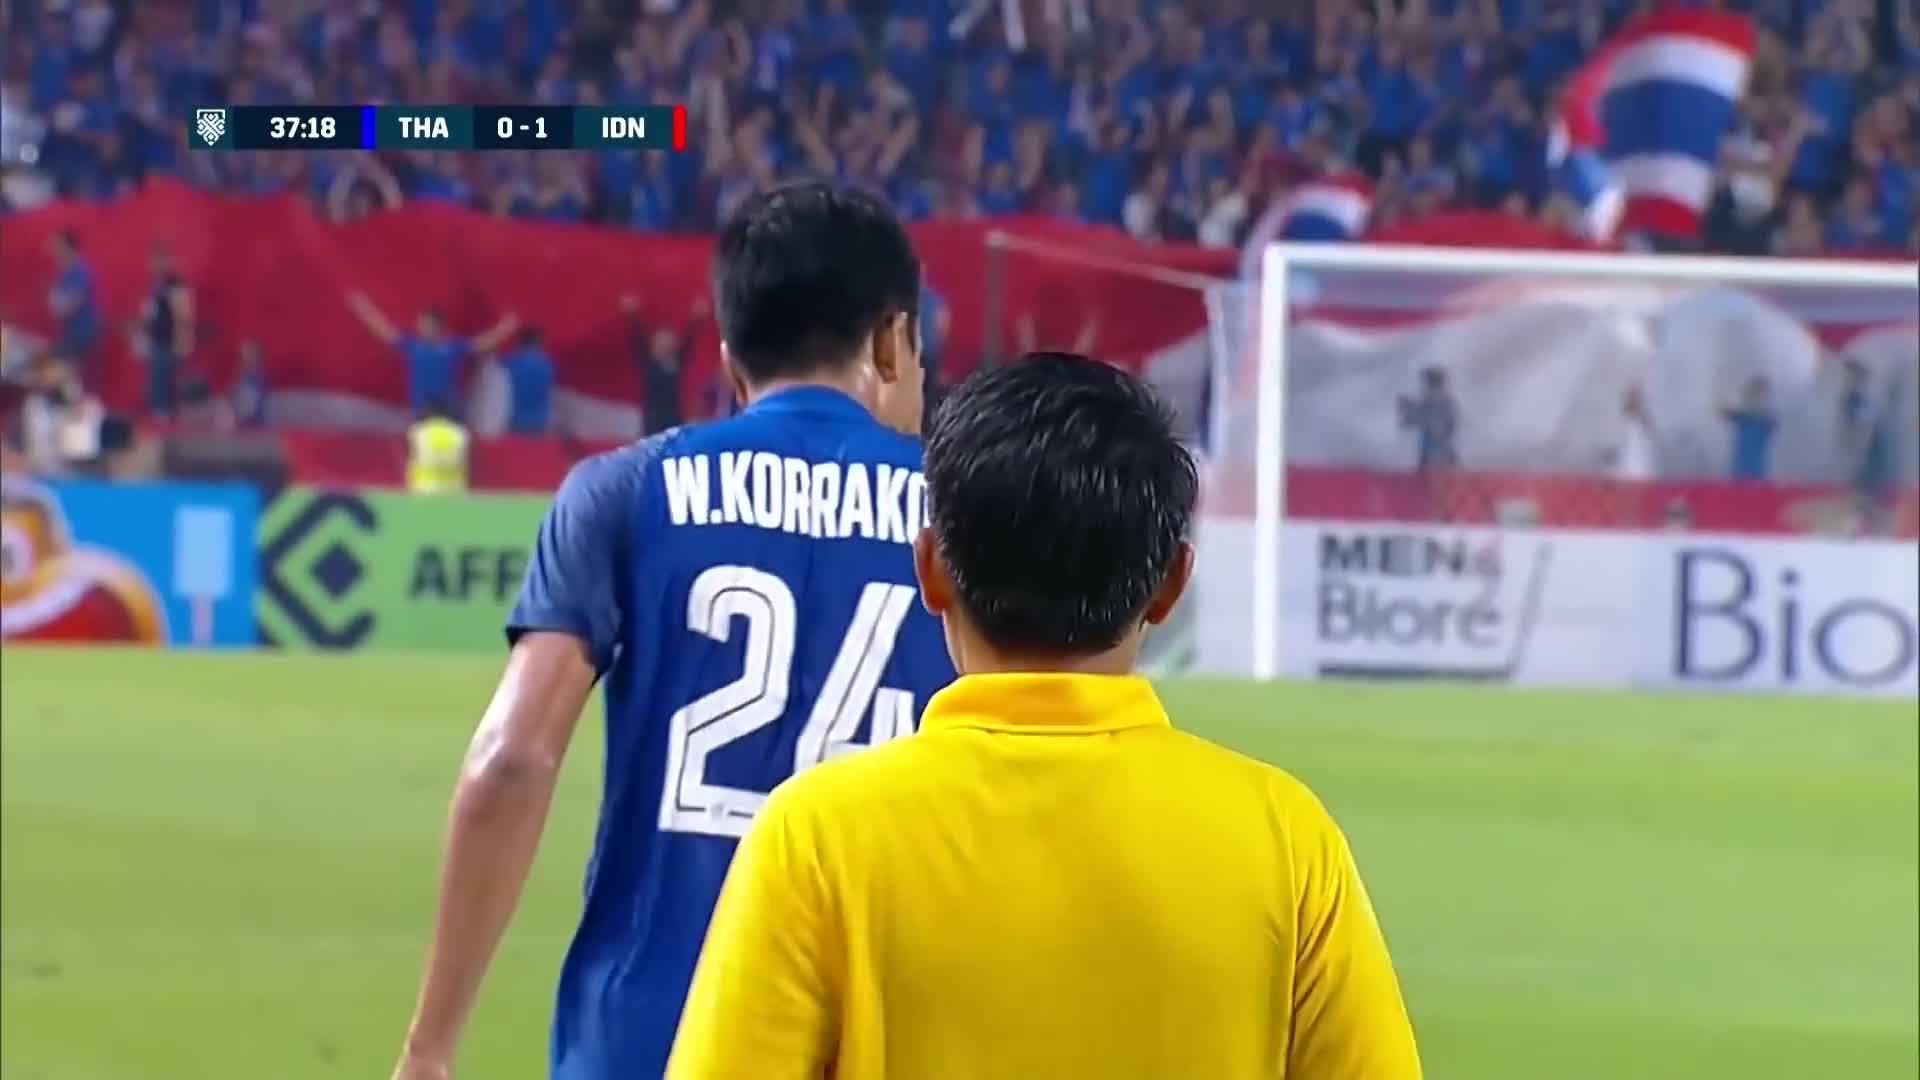 Korrakot Wiriyaudomsiri (Thái Lan 4-2 Indonesia)